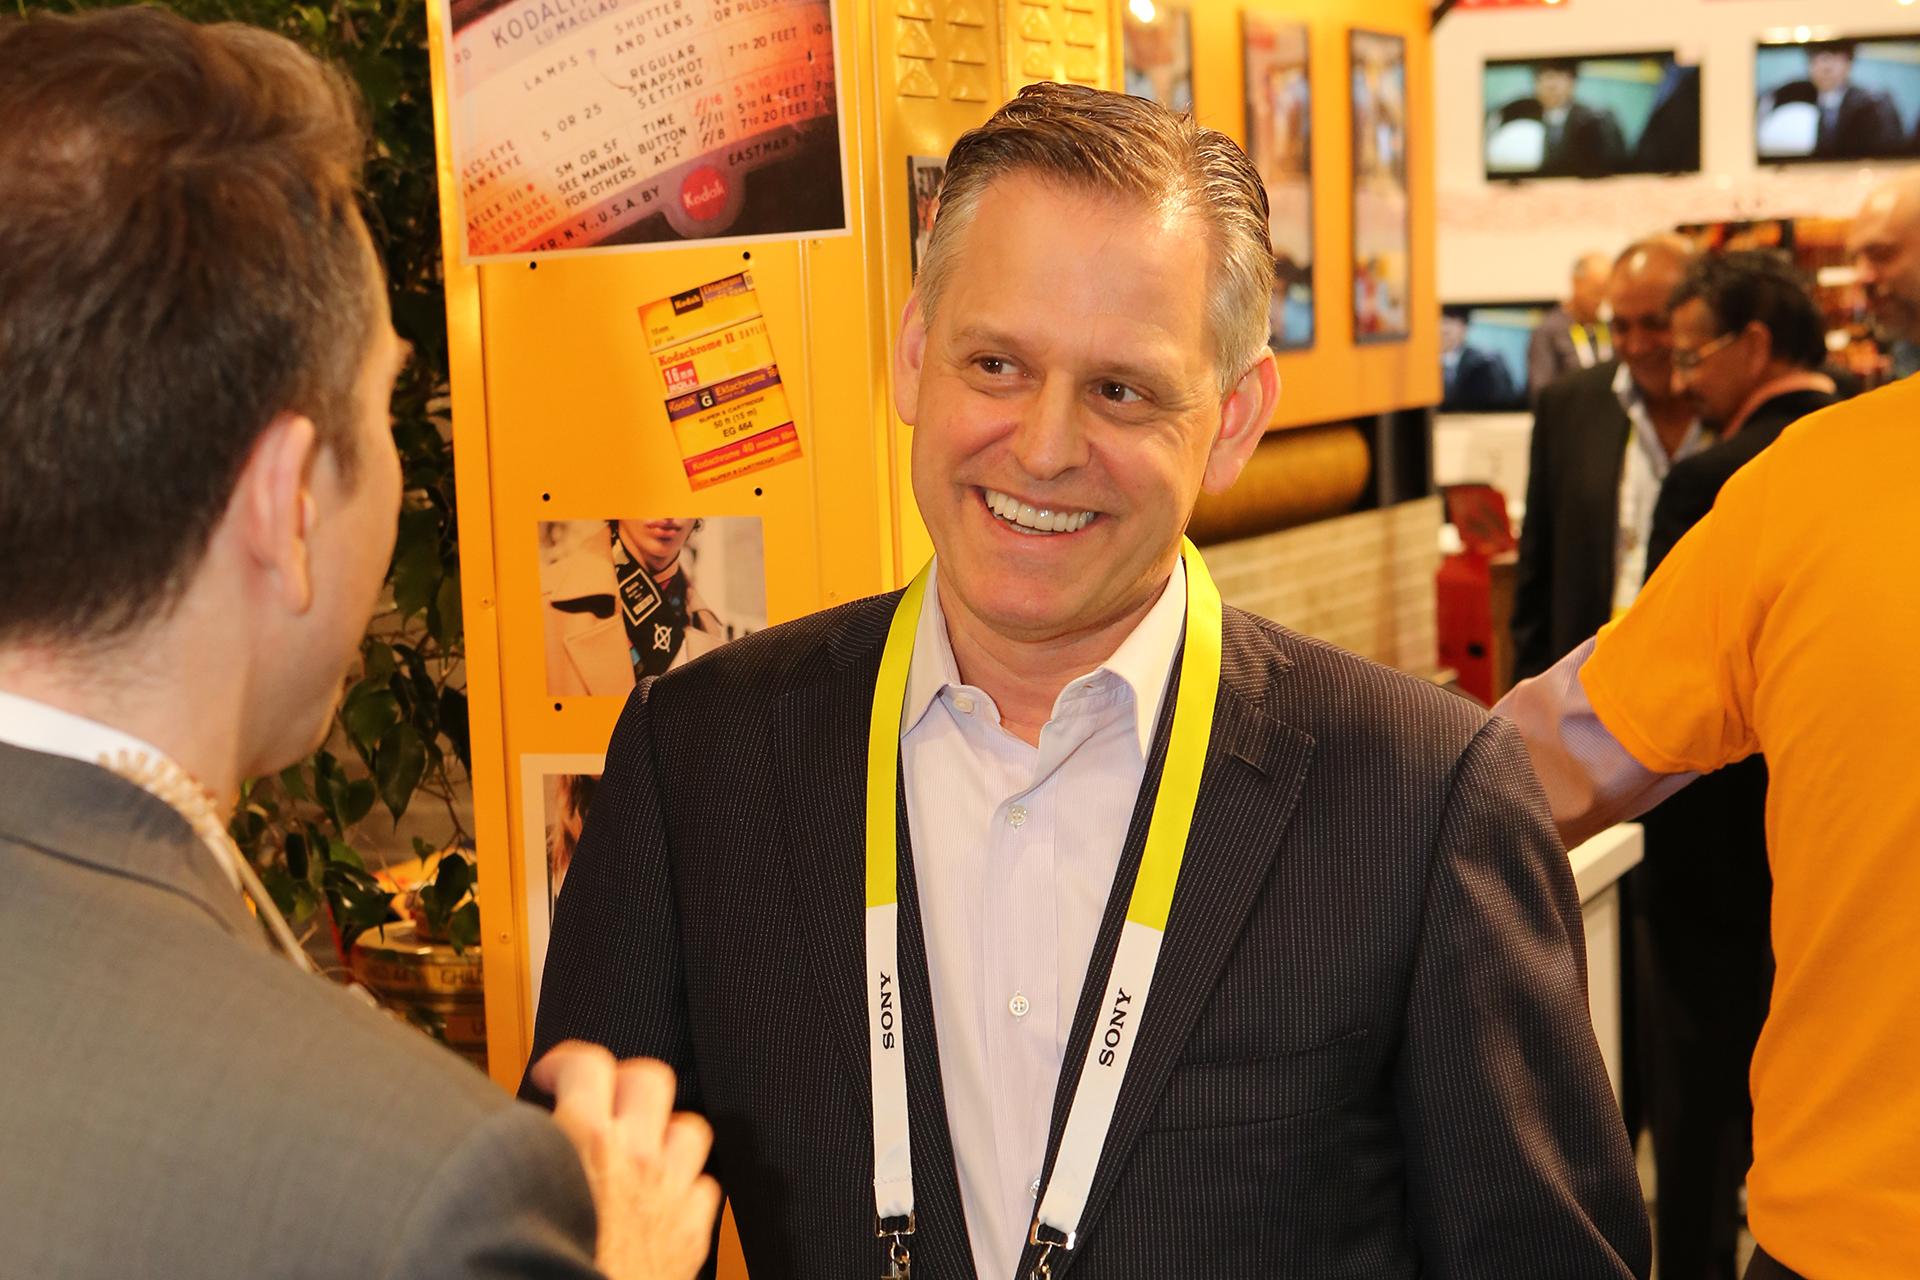 Kodak's big comeback is an old school throwback